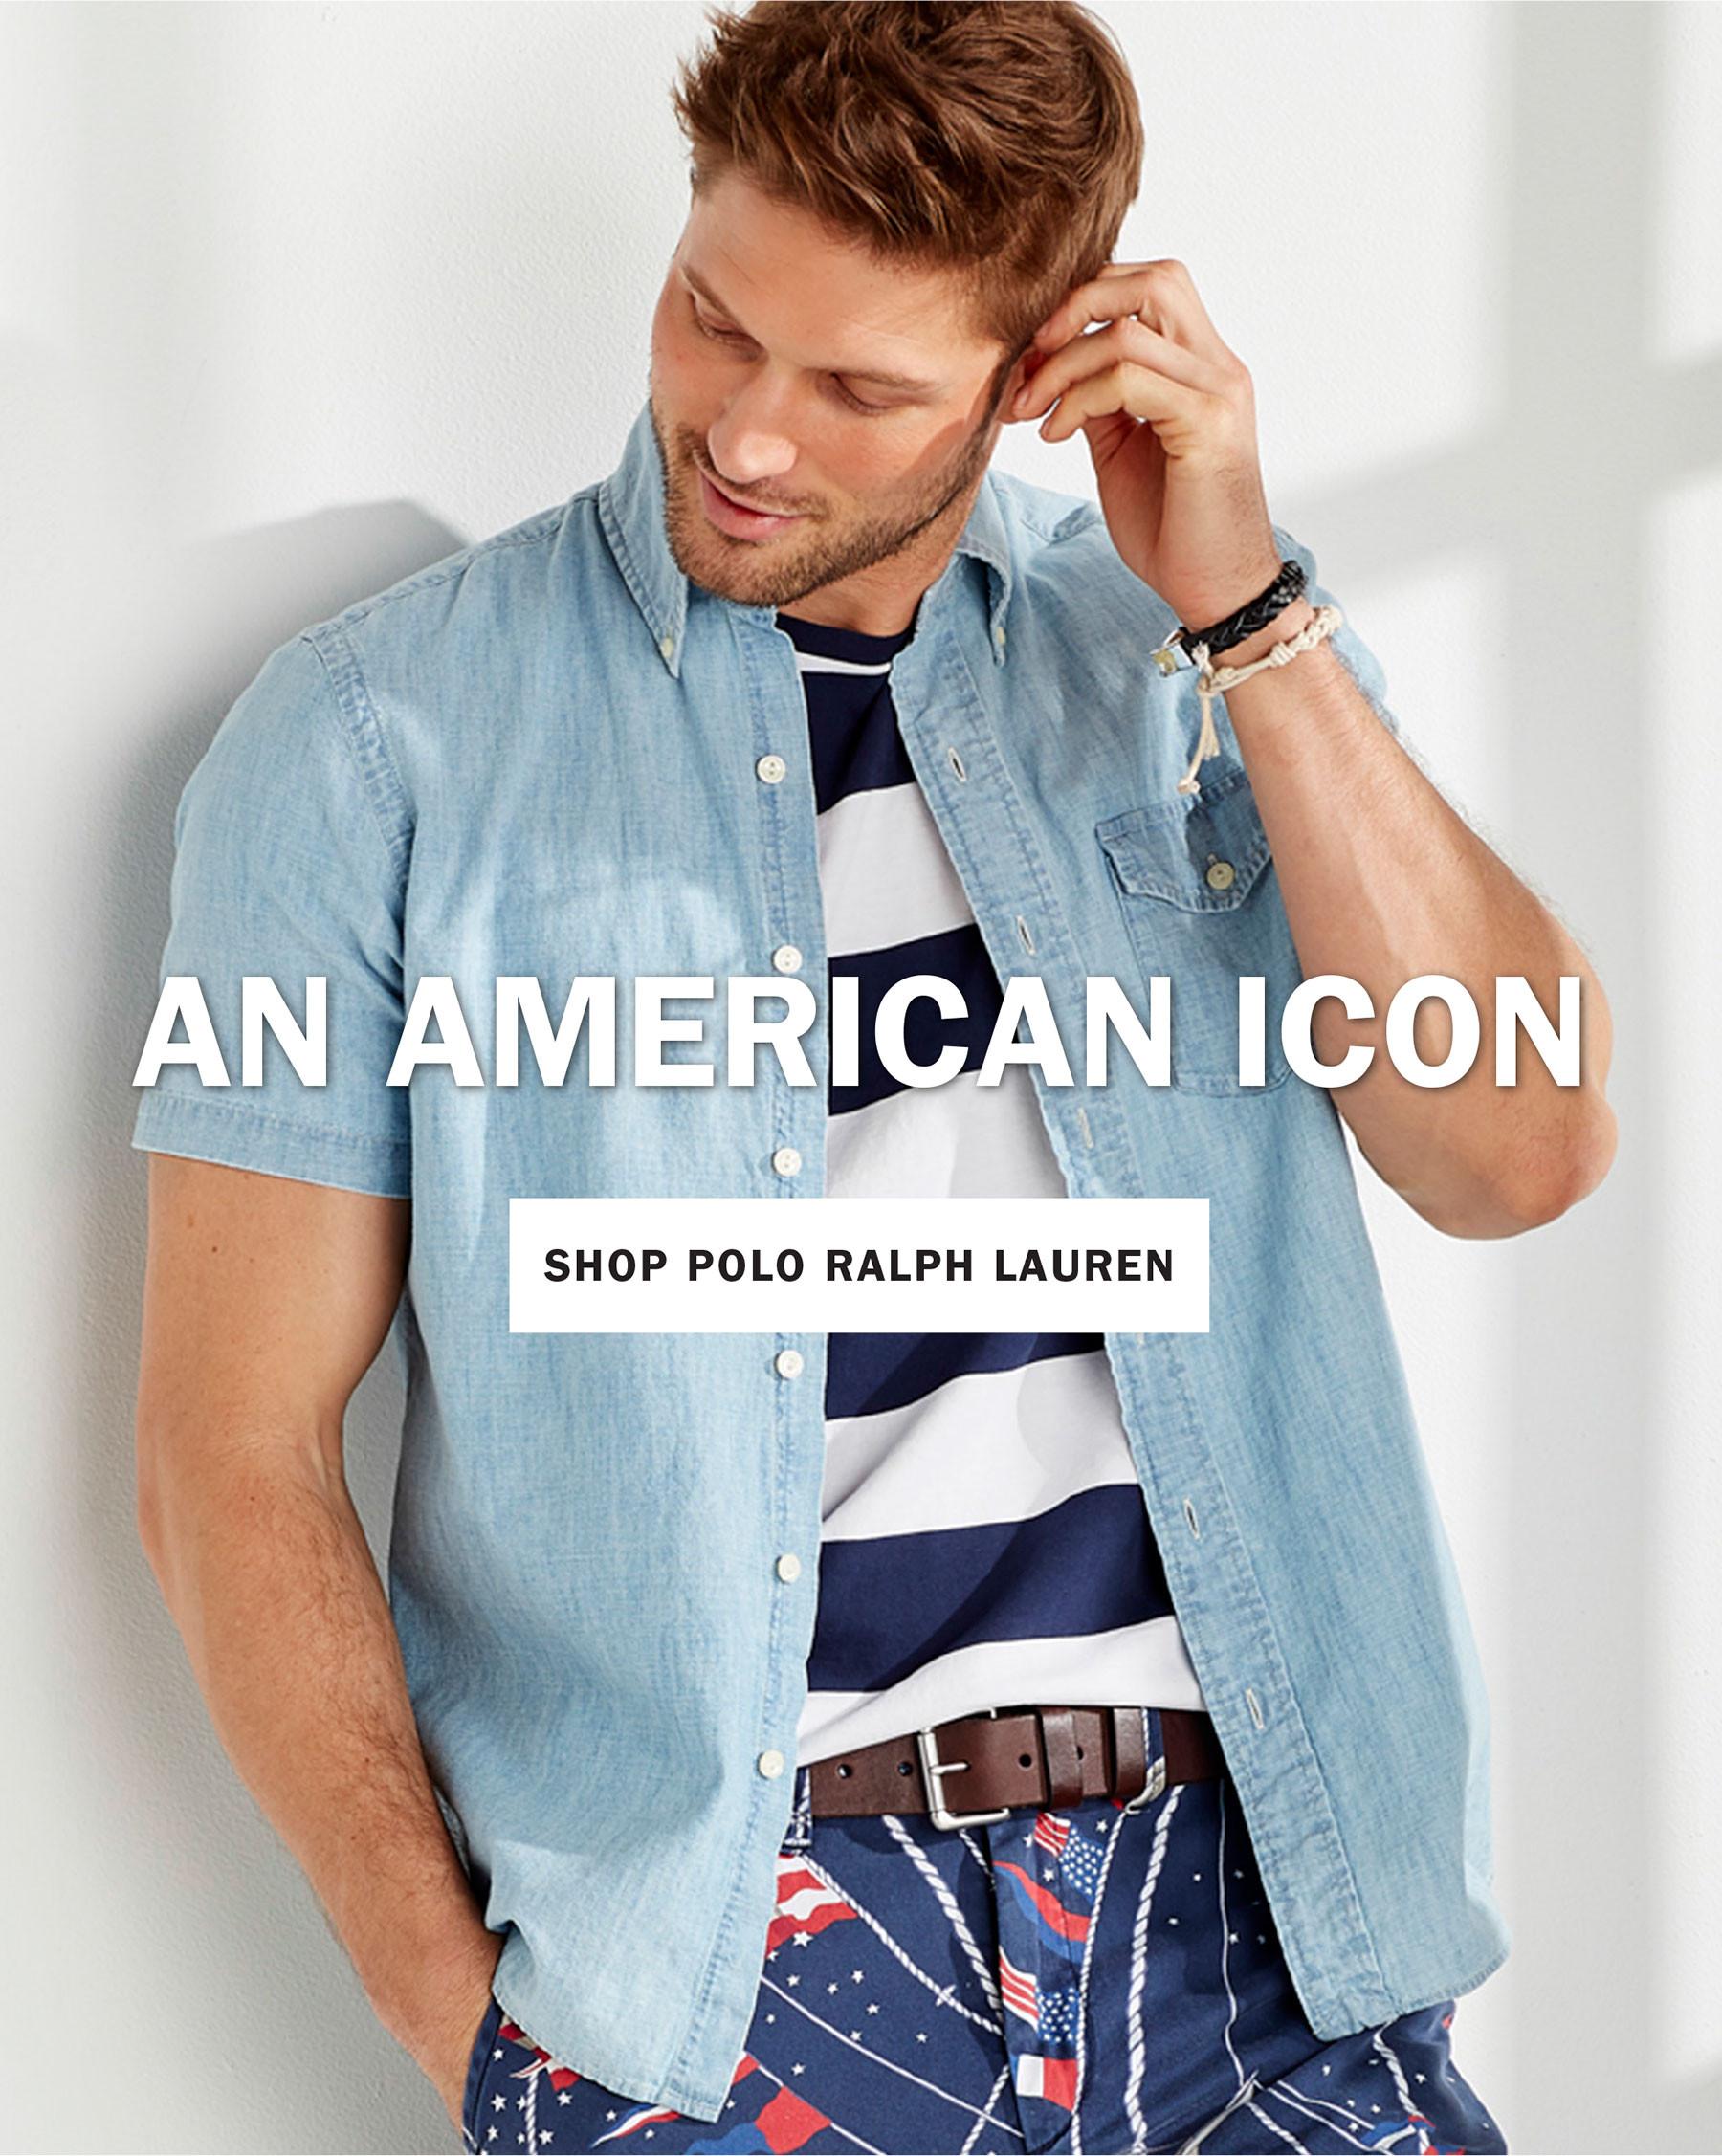 AN AMERICAN ICON | SHOP POLO RALPH LAUREN